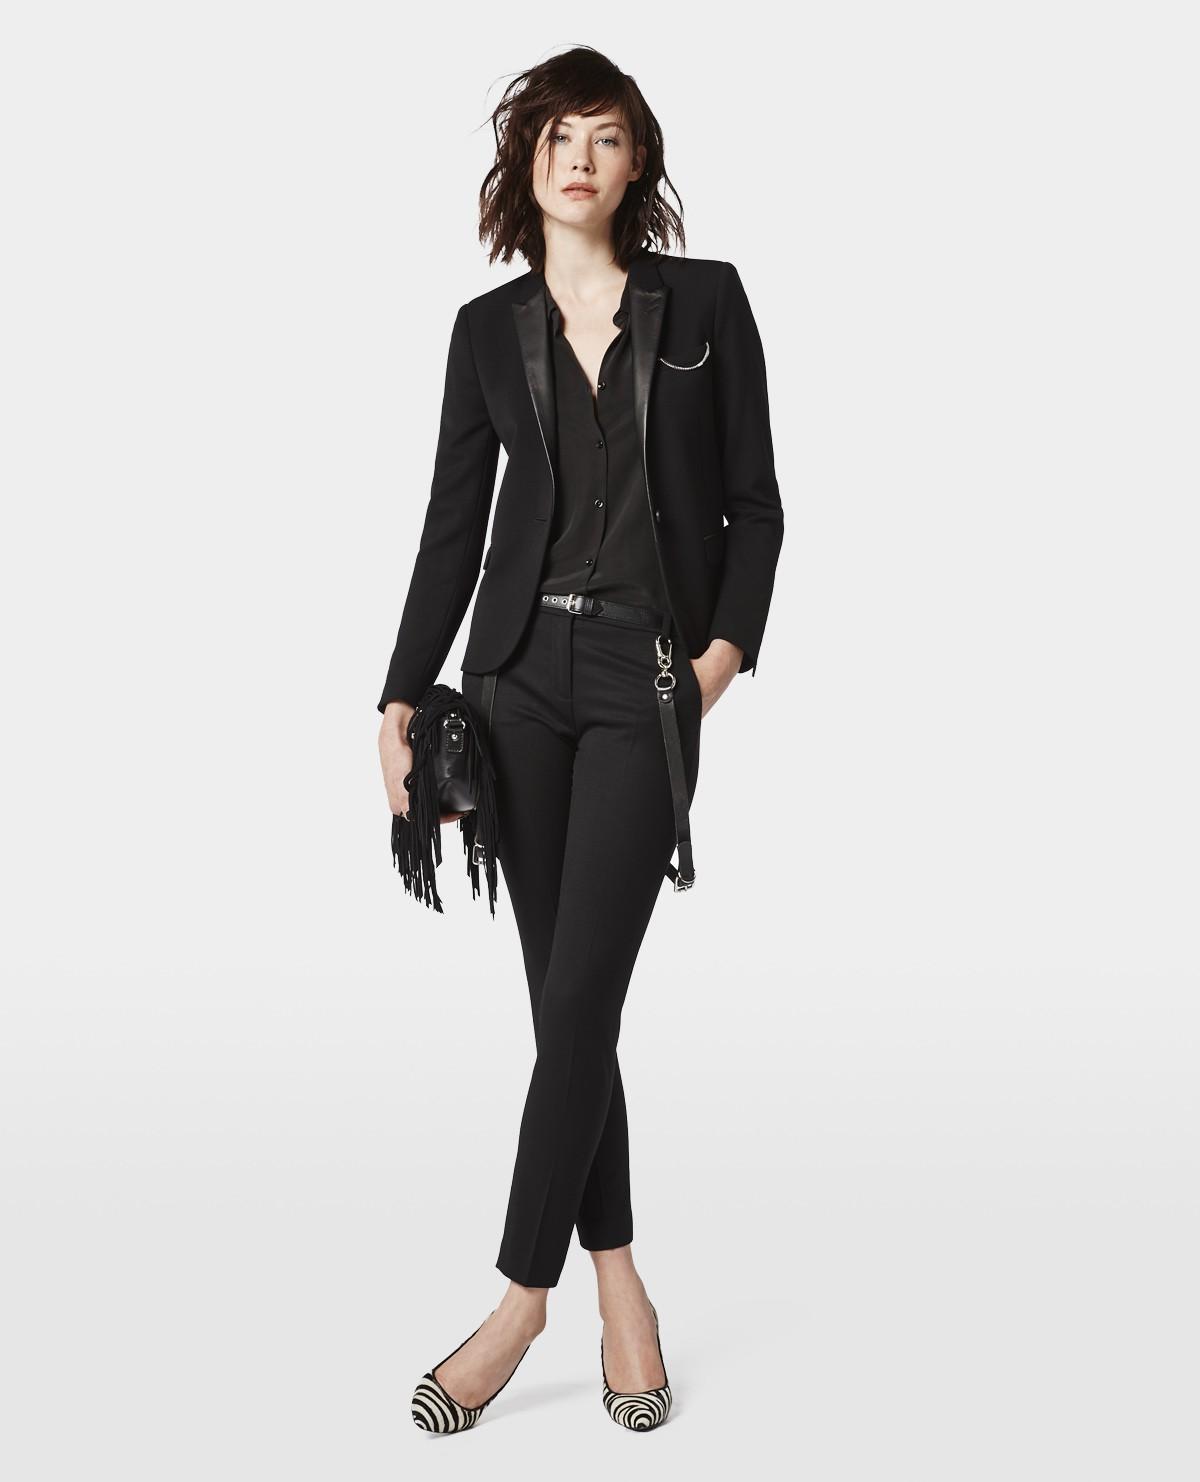 Veste blazer femme col cuir